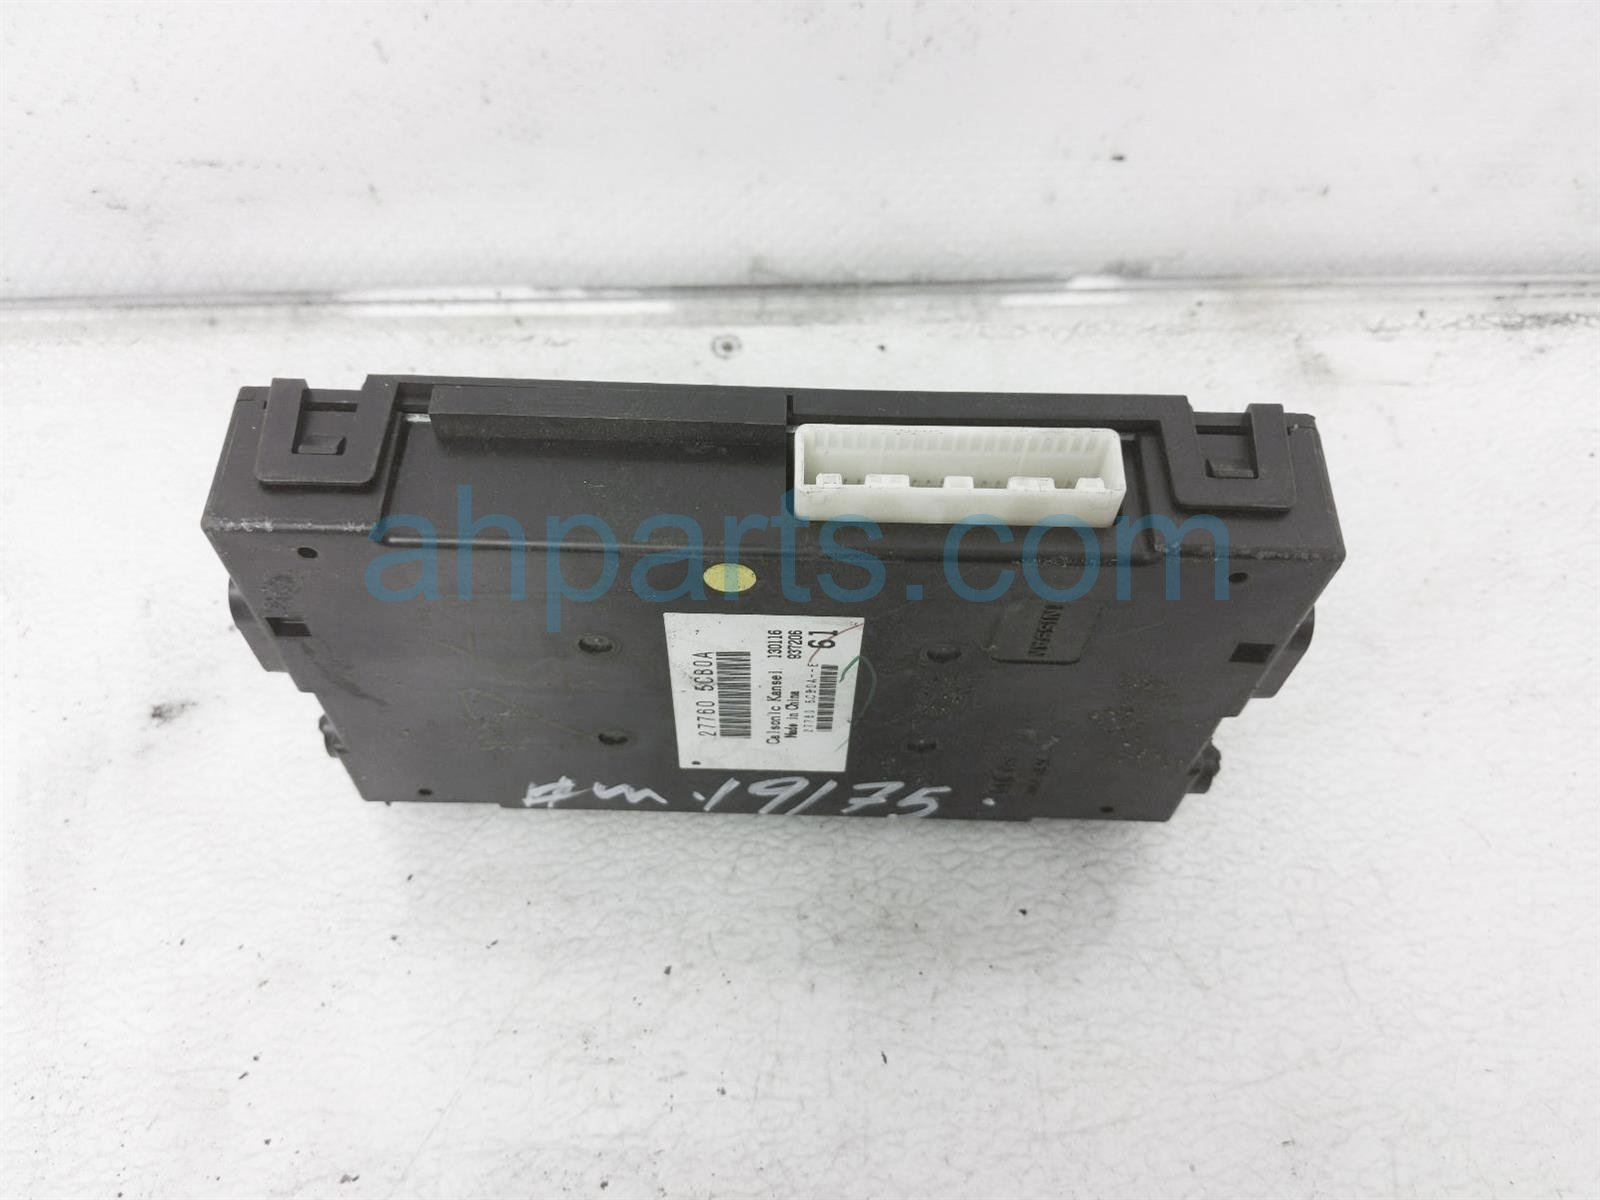 2016 Infiniti Q50 Air Amplifier Control Unit 27760 5CB0A Replacement